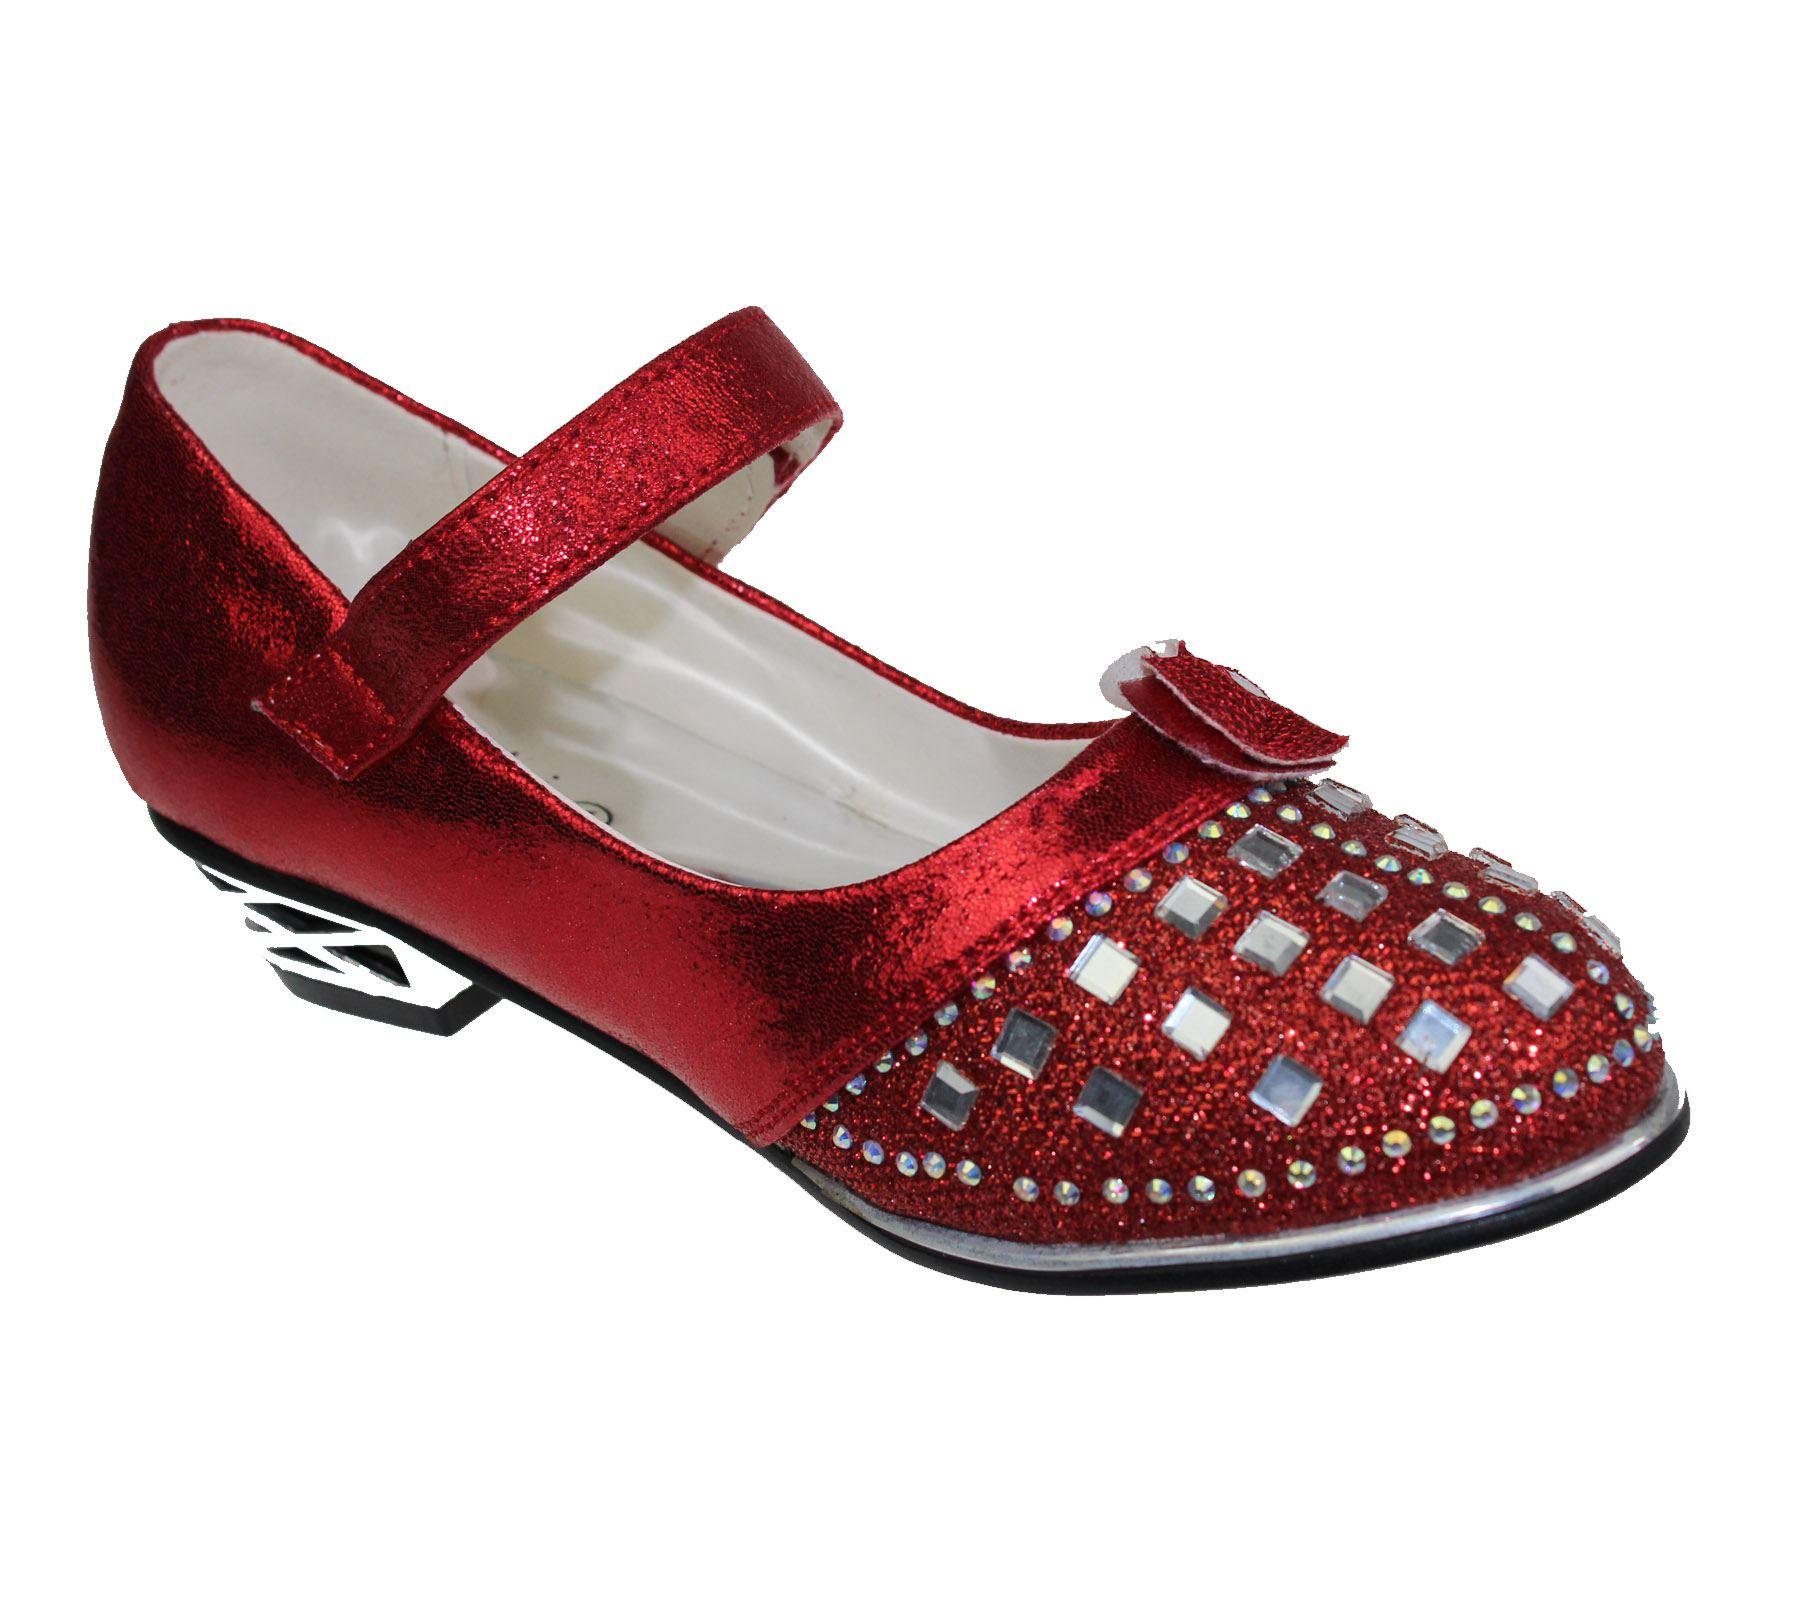 Bid or buy dress shoes